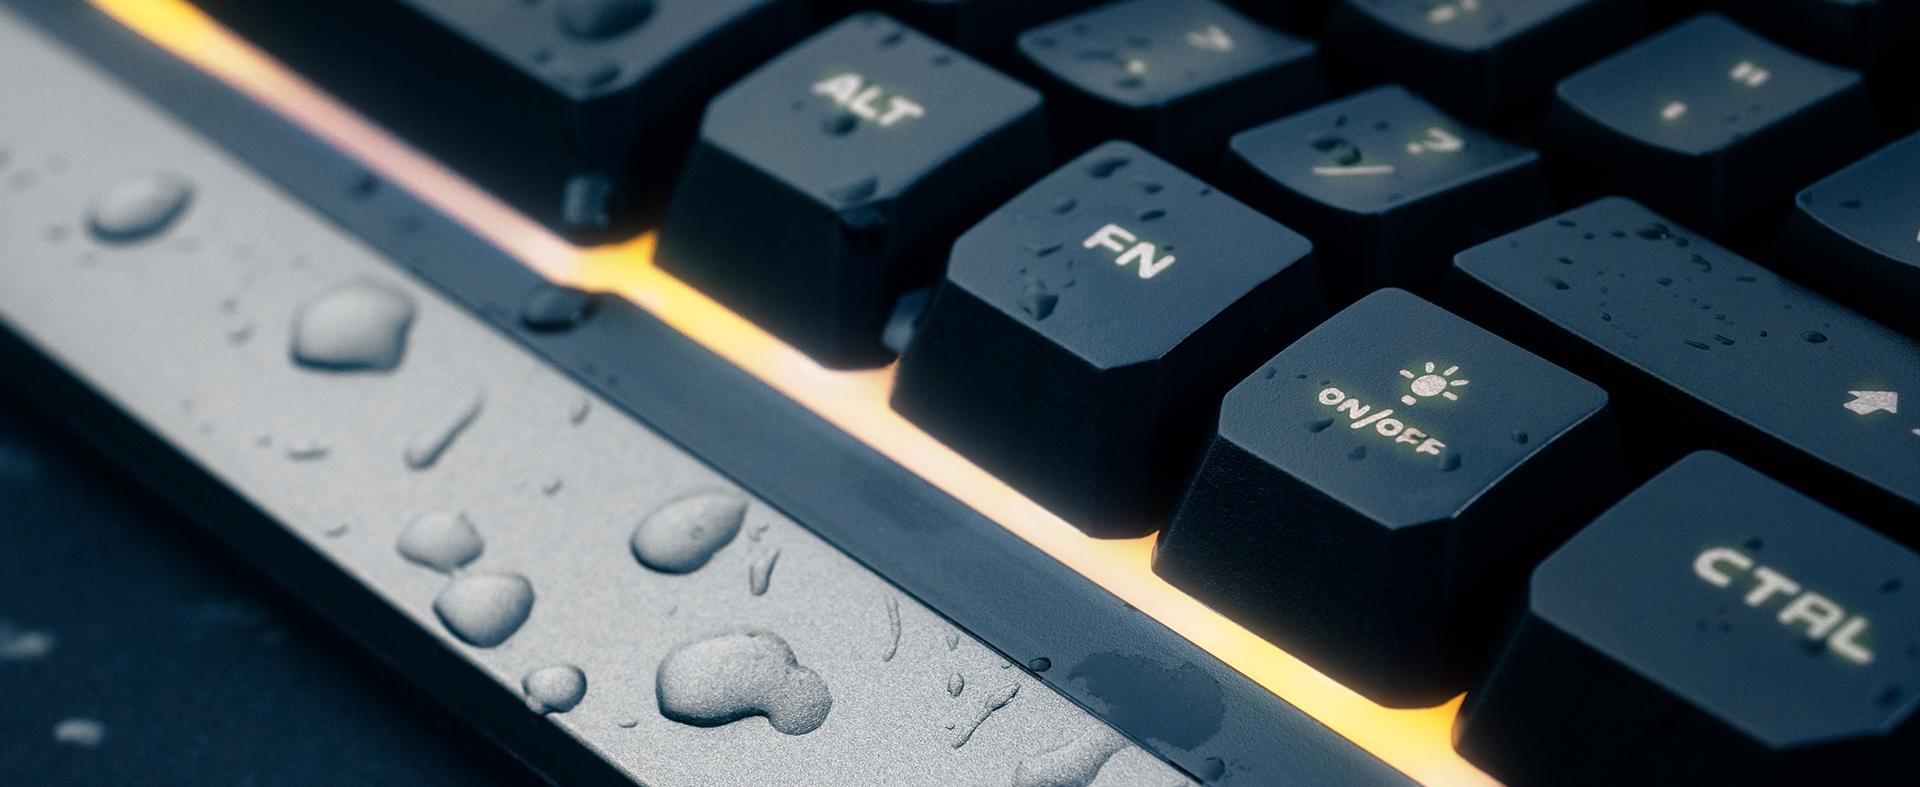 backlit gaming keyboard genesis rhod 300 us layout 8